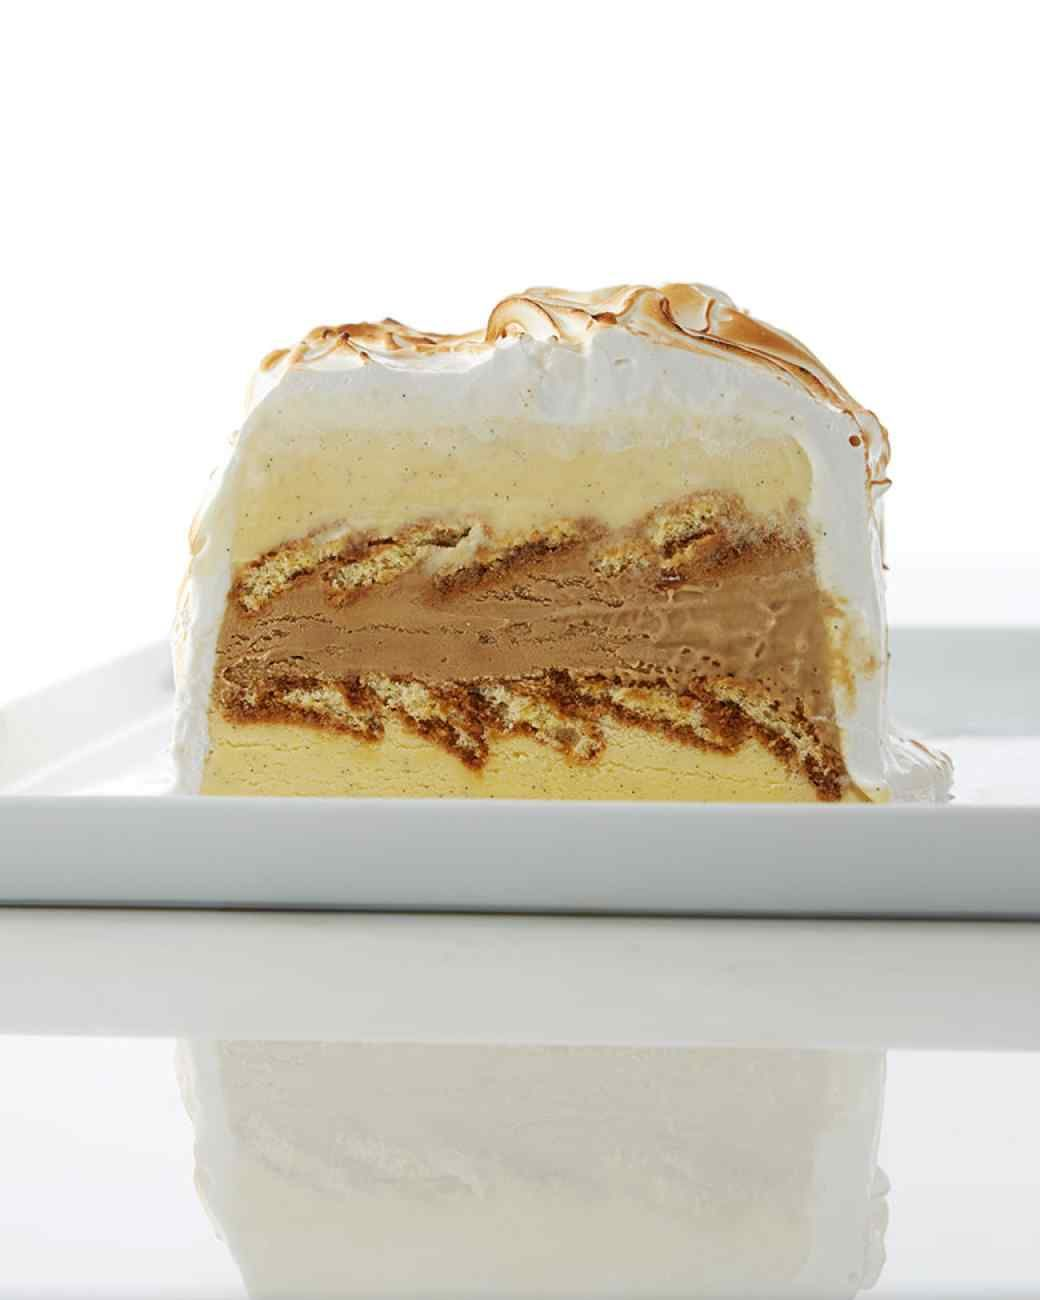 Martha Bakes Tiramisu Ice Cream Cake